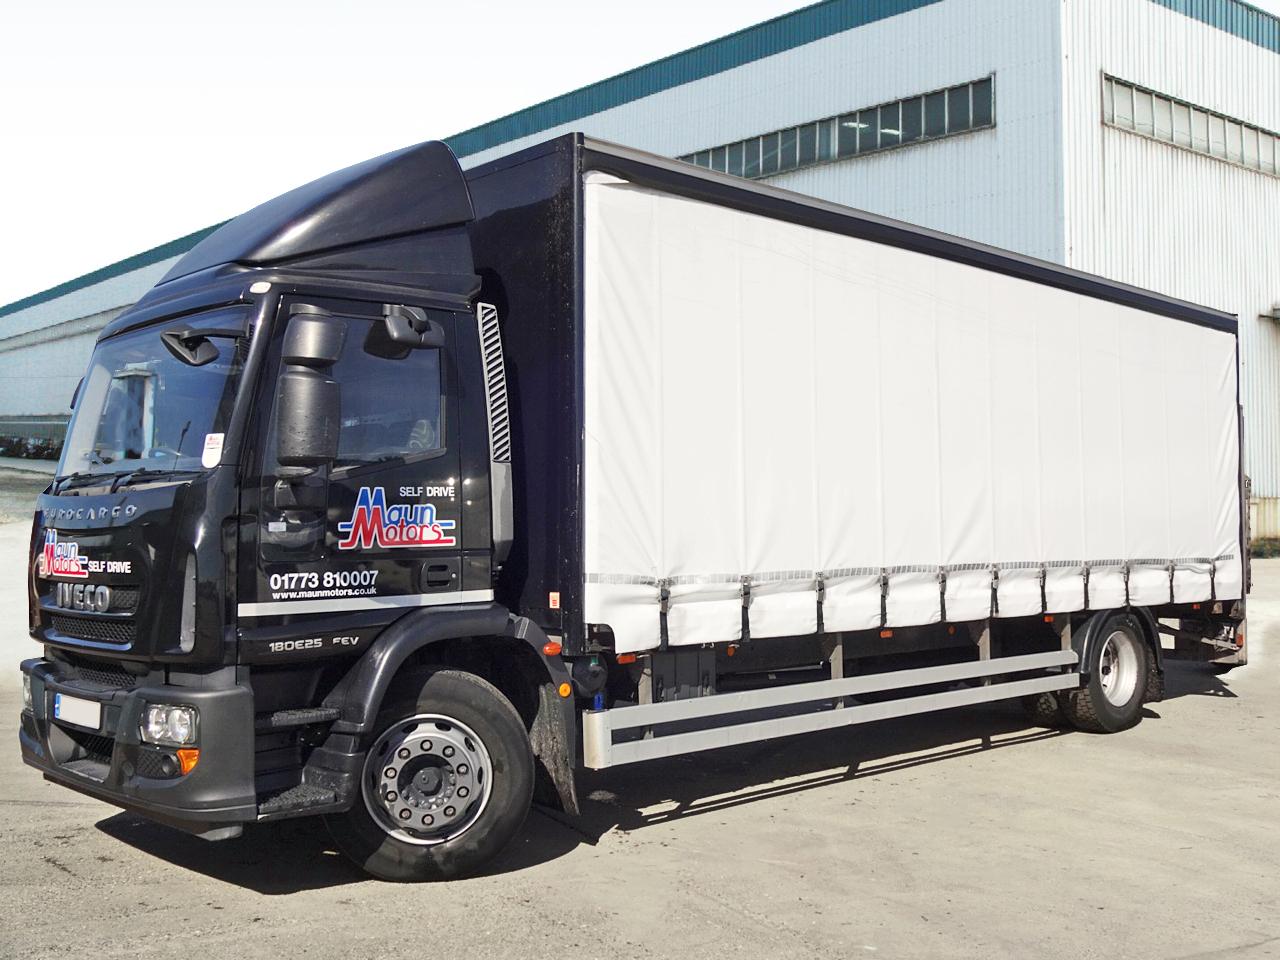 Maun Motors Self Drive 18t Curtain Side Truck Hire Day